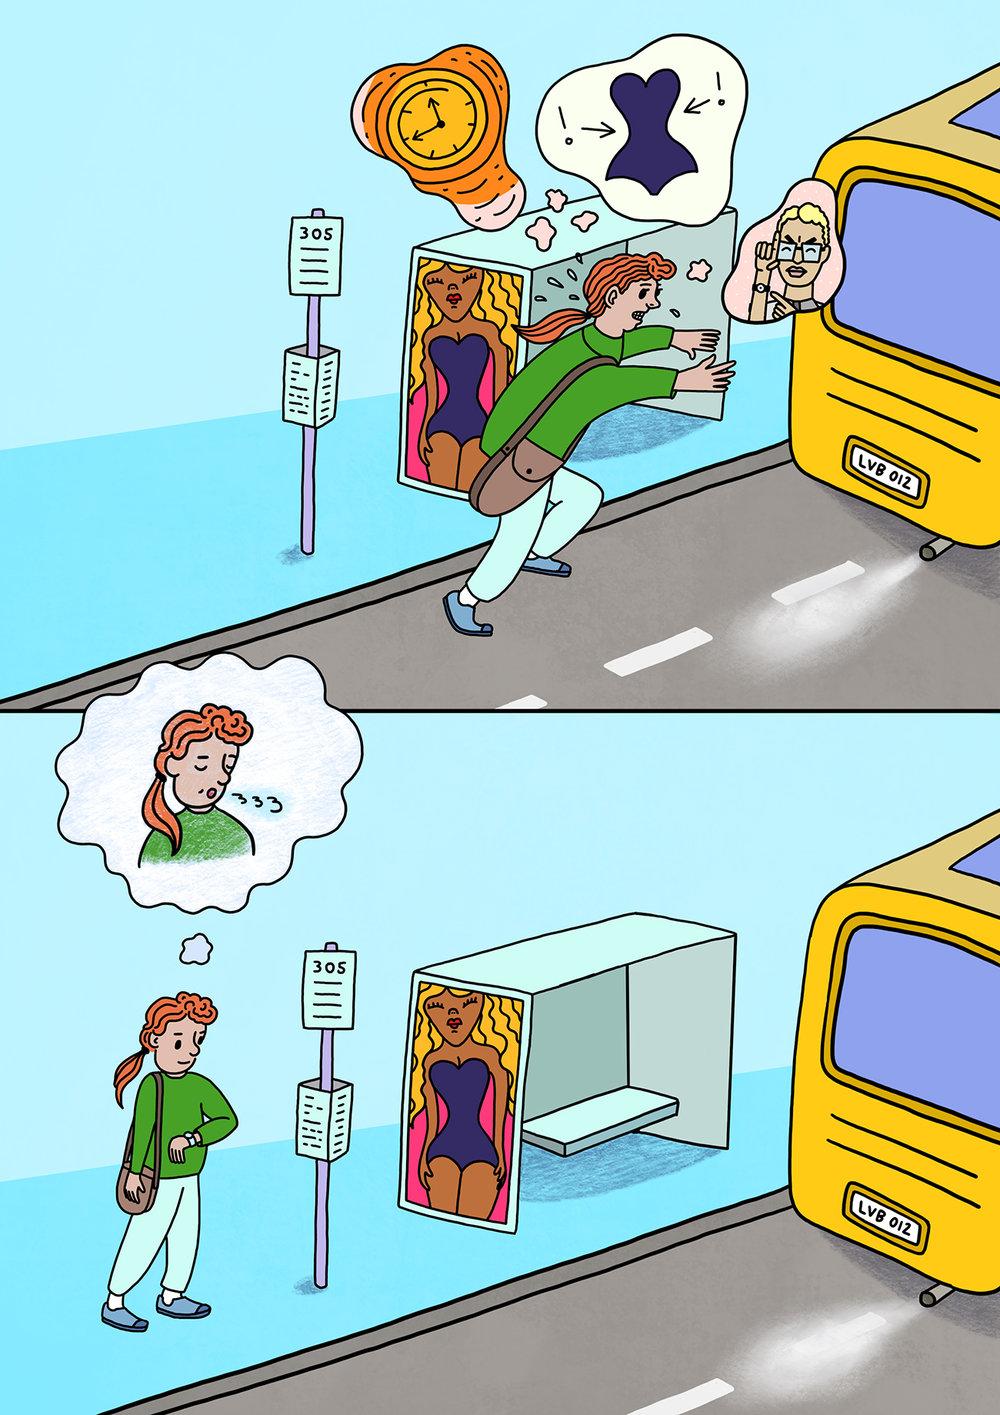 busskur.jpg